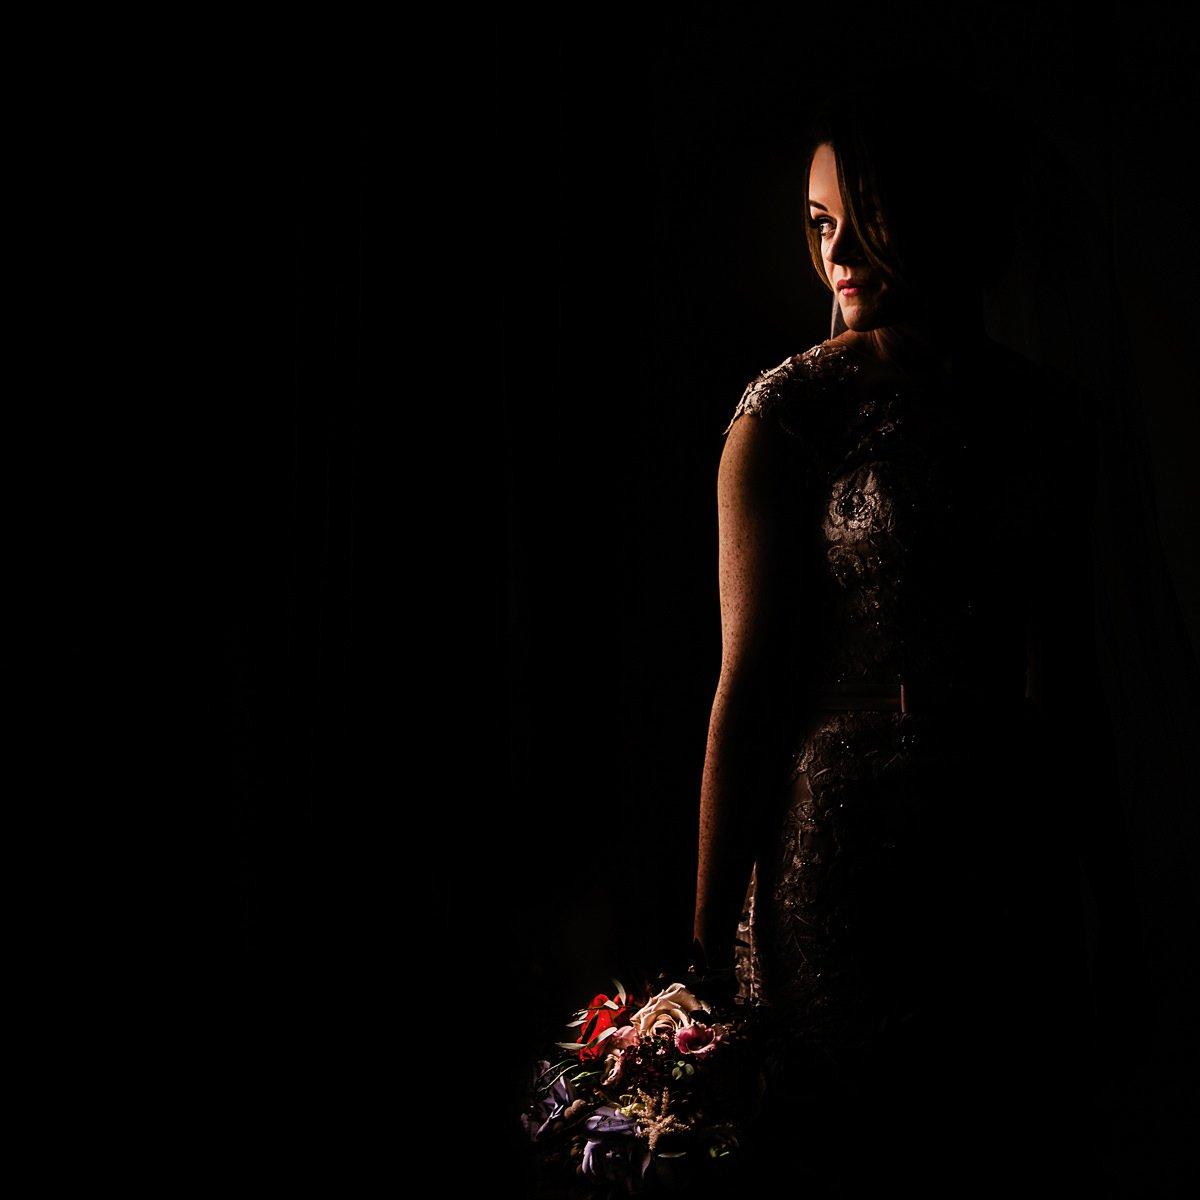 bridal portrait using window light